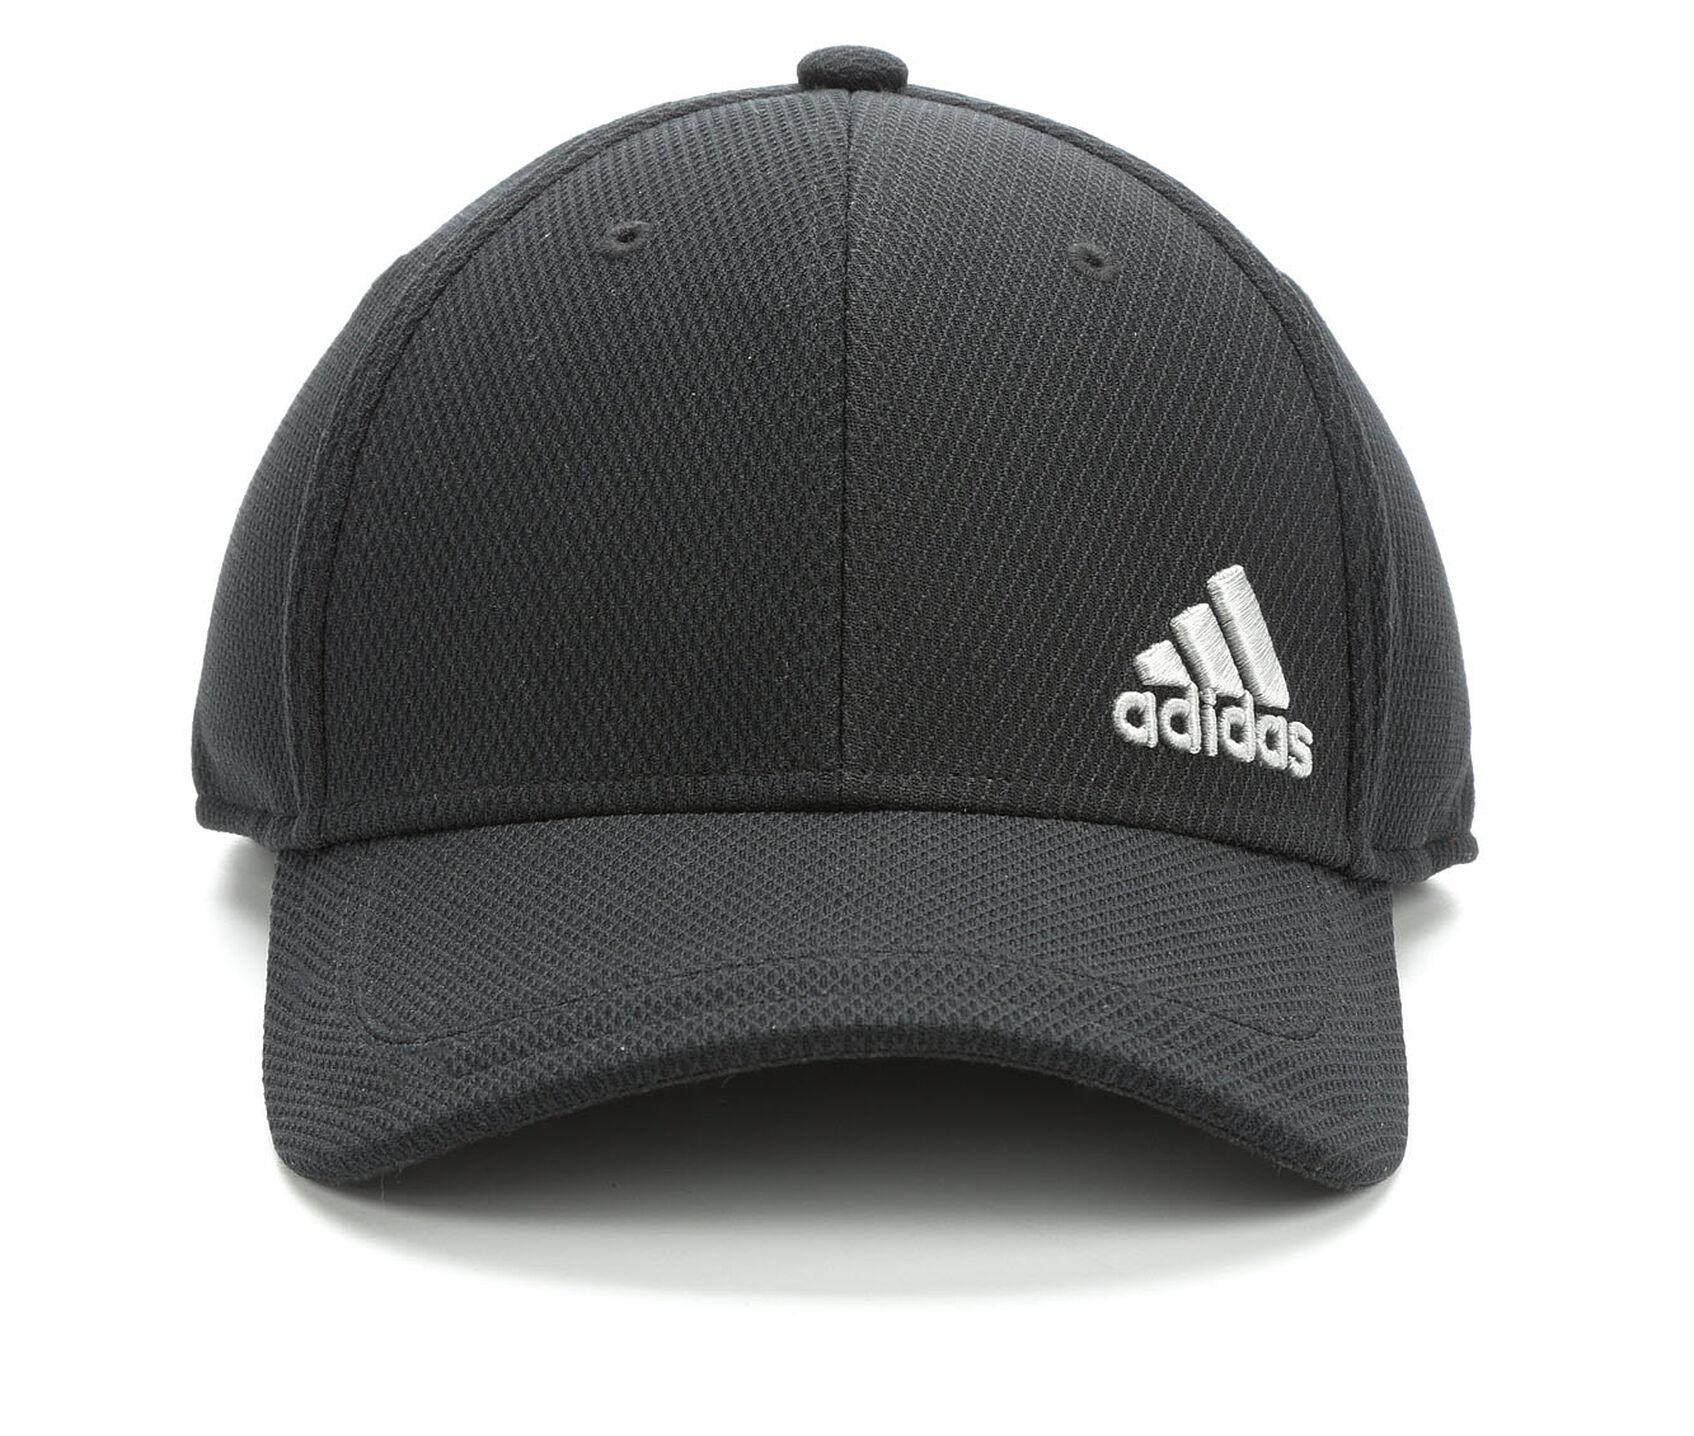 8ea8760d7ed Adidas Men  39 s Release Stretch Fit Baseball Cap. Carousel Controls  Previous